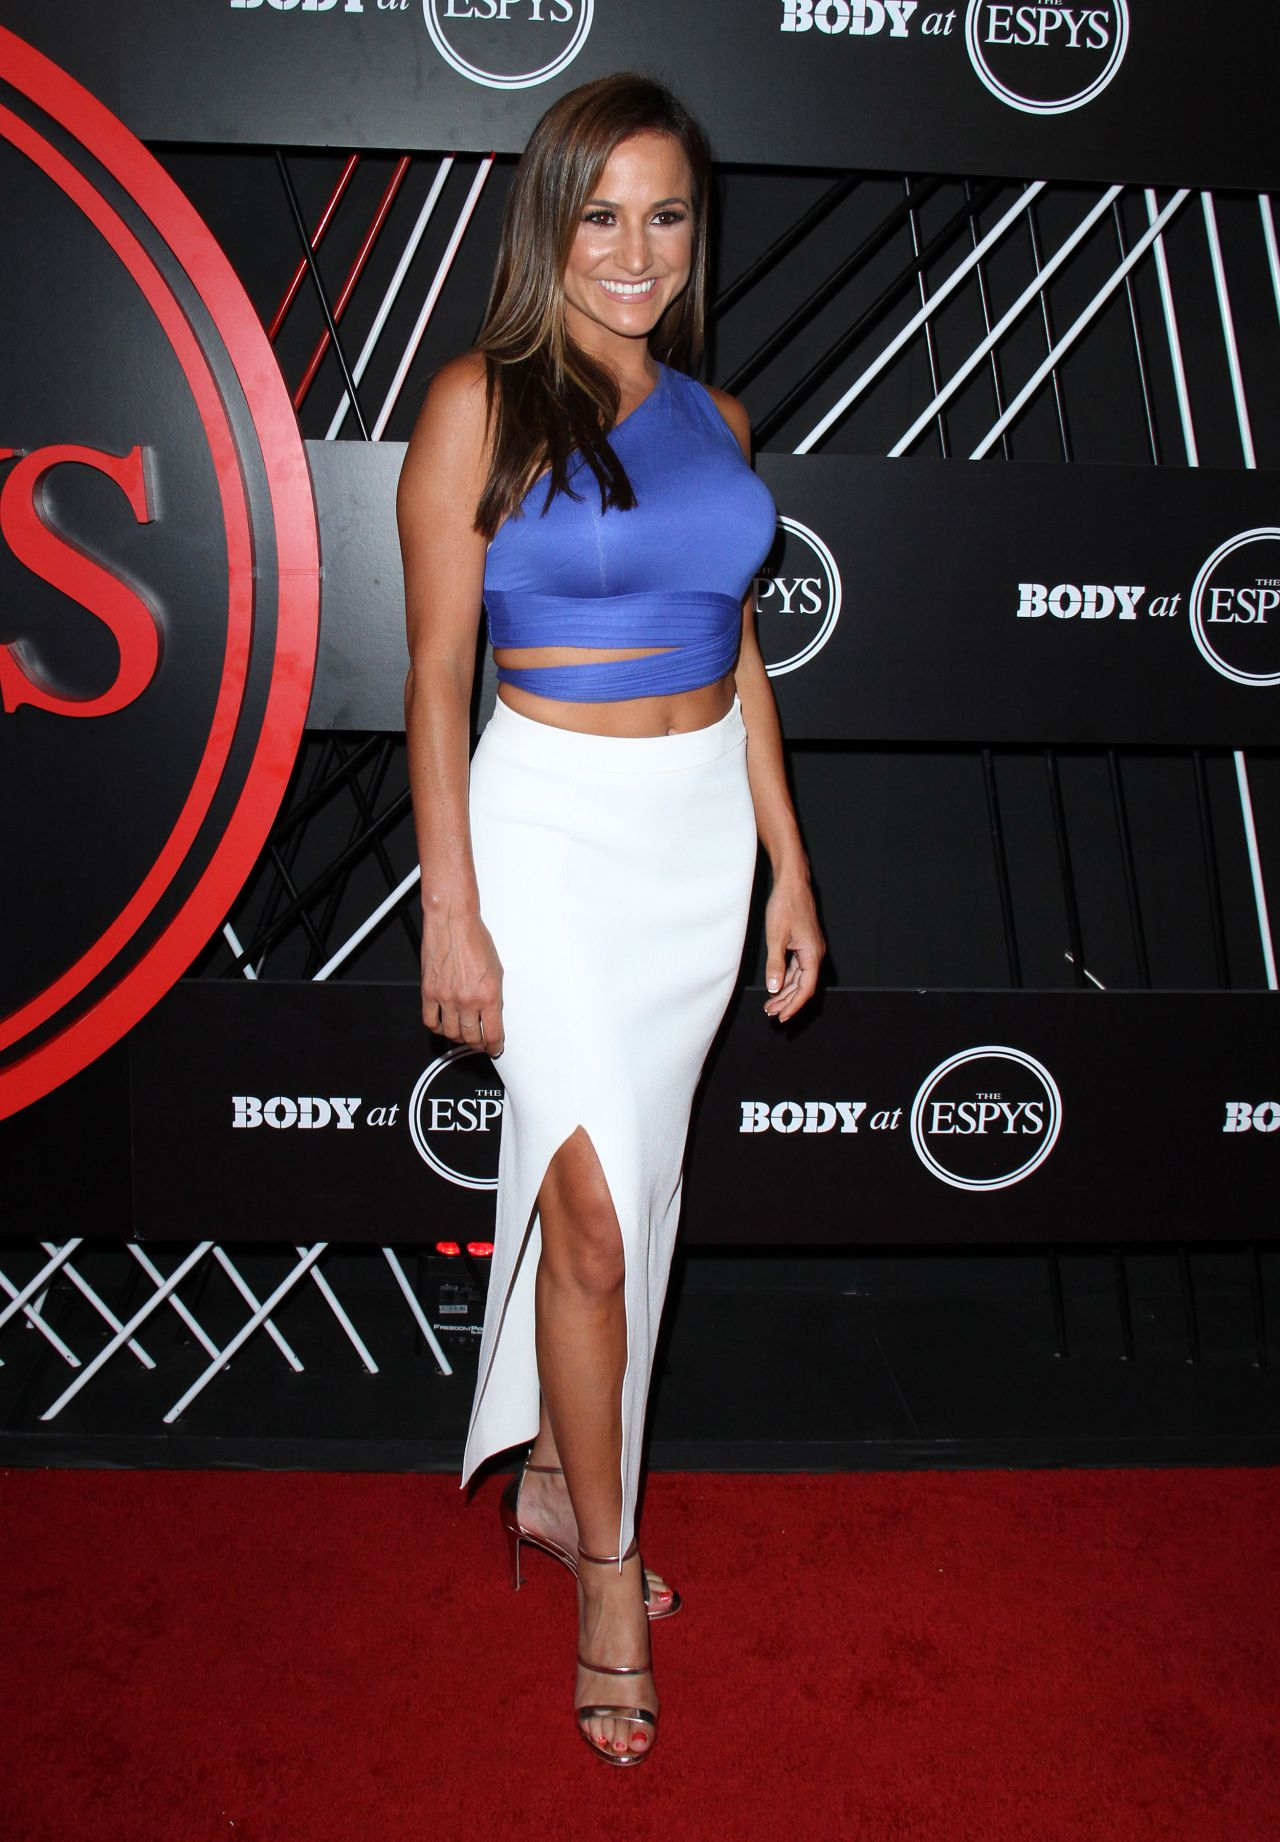 Dianna Russini - ESPYS 2019 Awards in Los Angeles-01